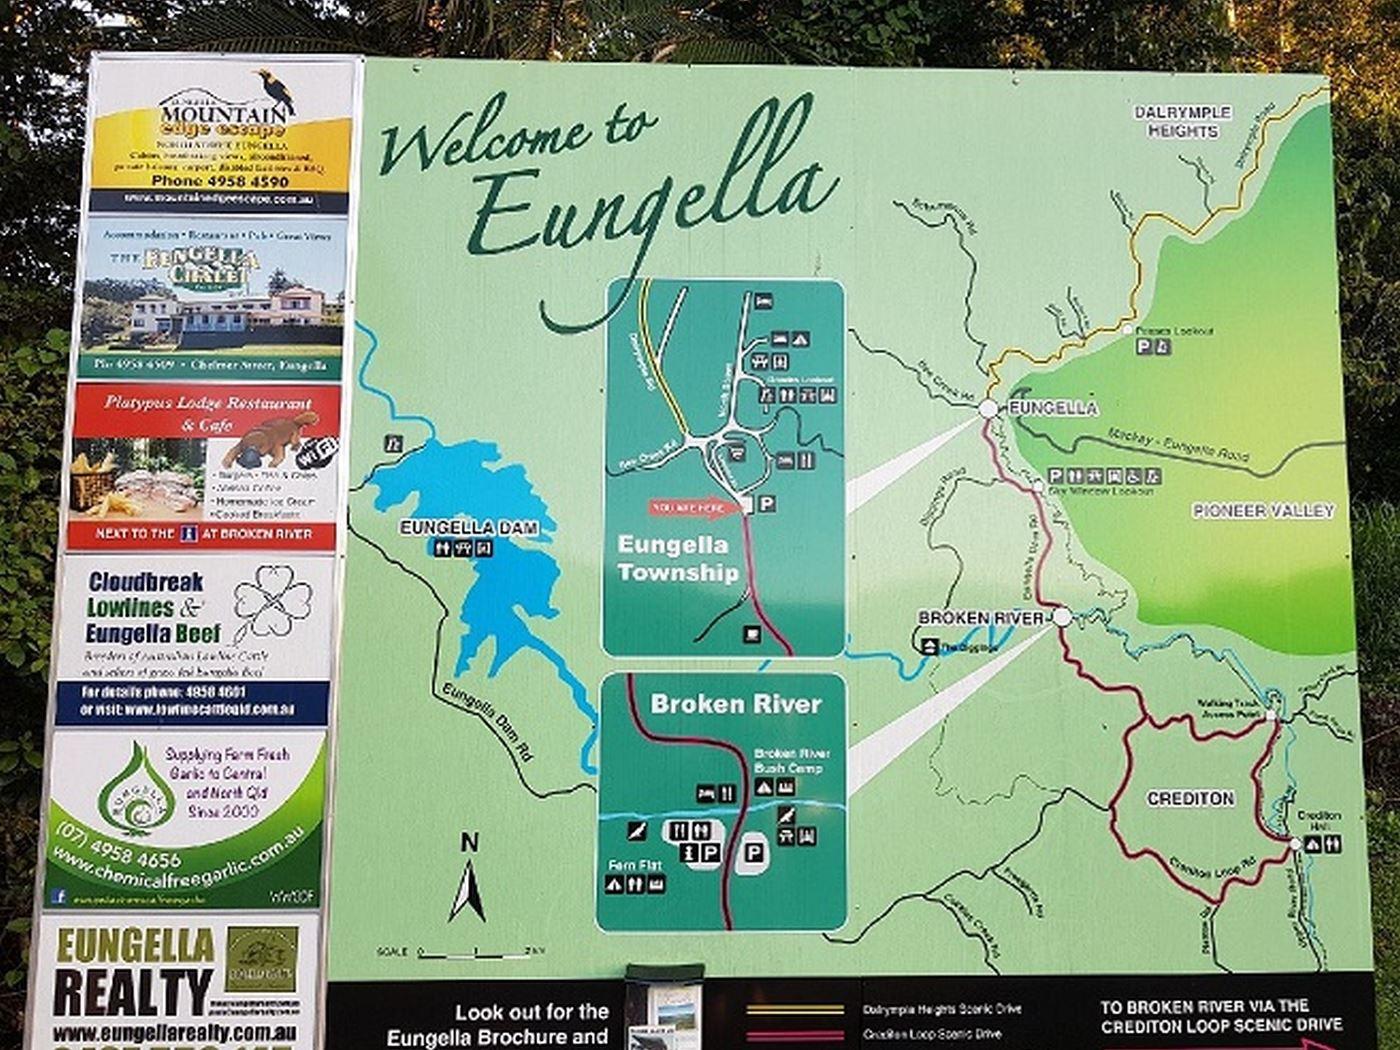 Eungella Business Group